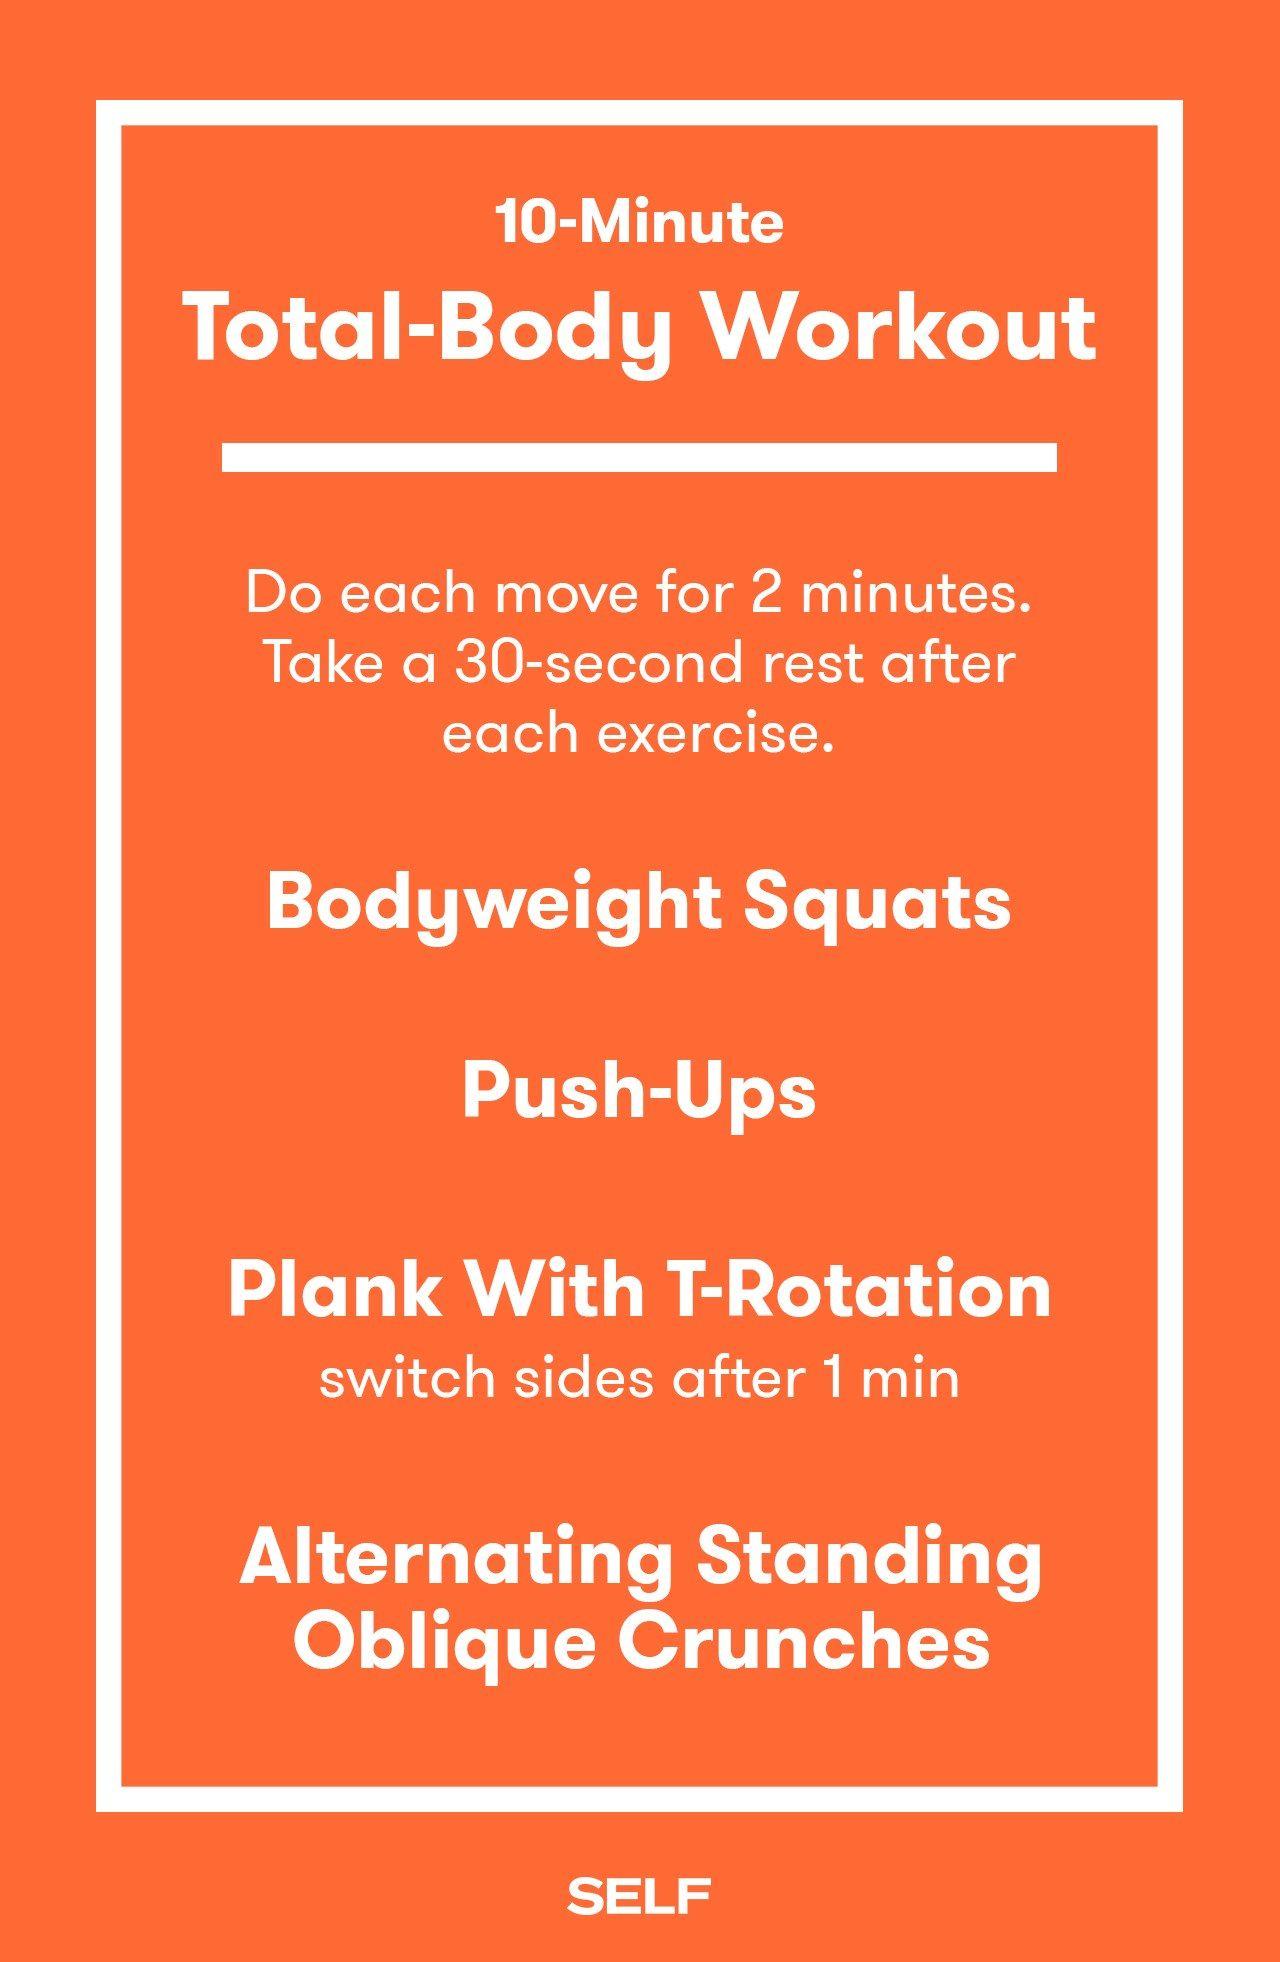 foto 10-Minute Bodyweight Circuit Workout